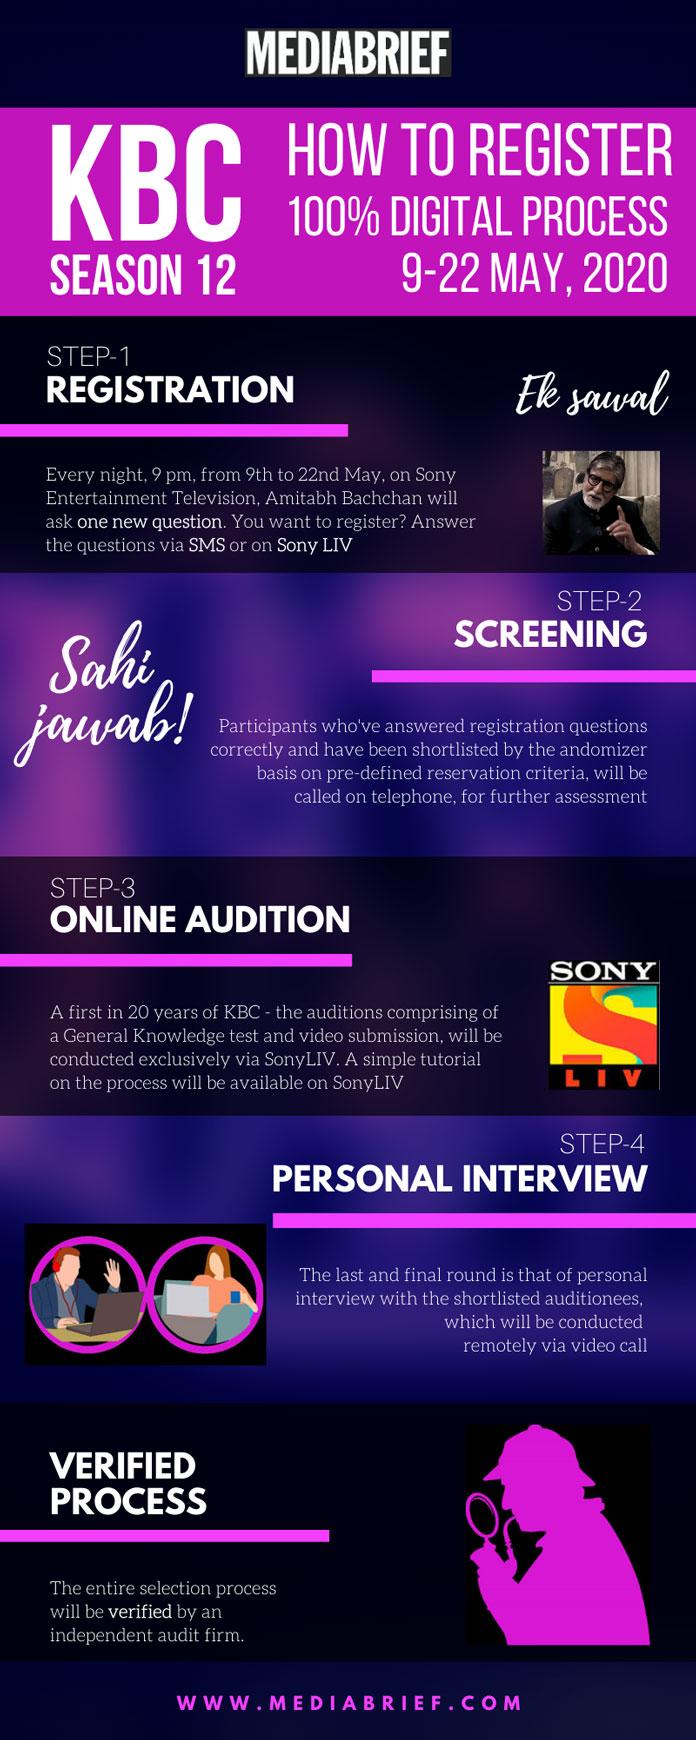 image-KBC-season-12-How-To-Register-Infographic-Mediabrief